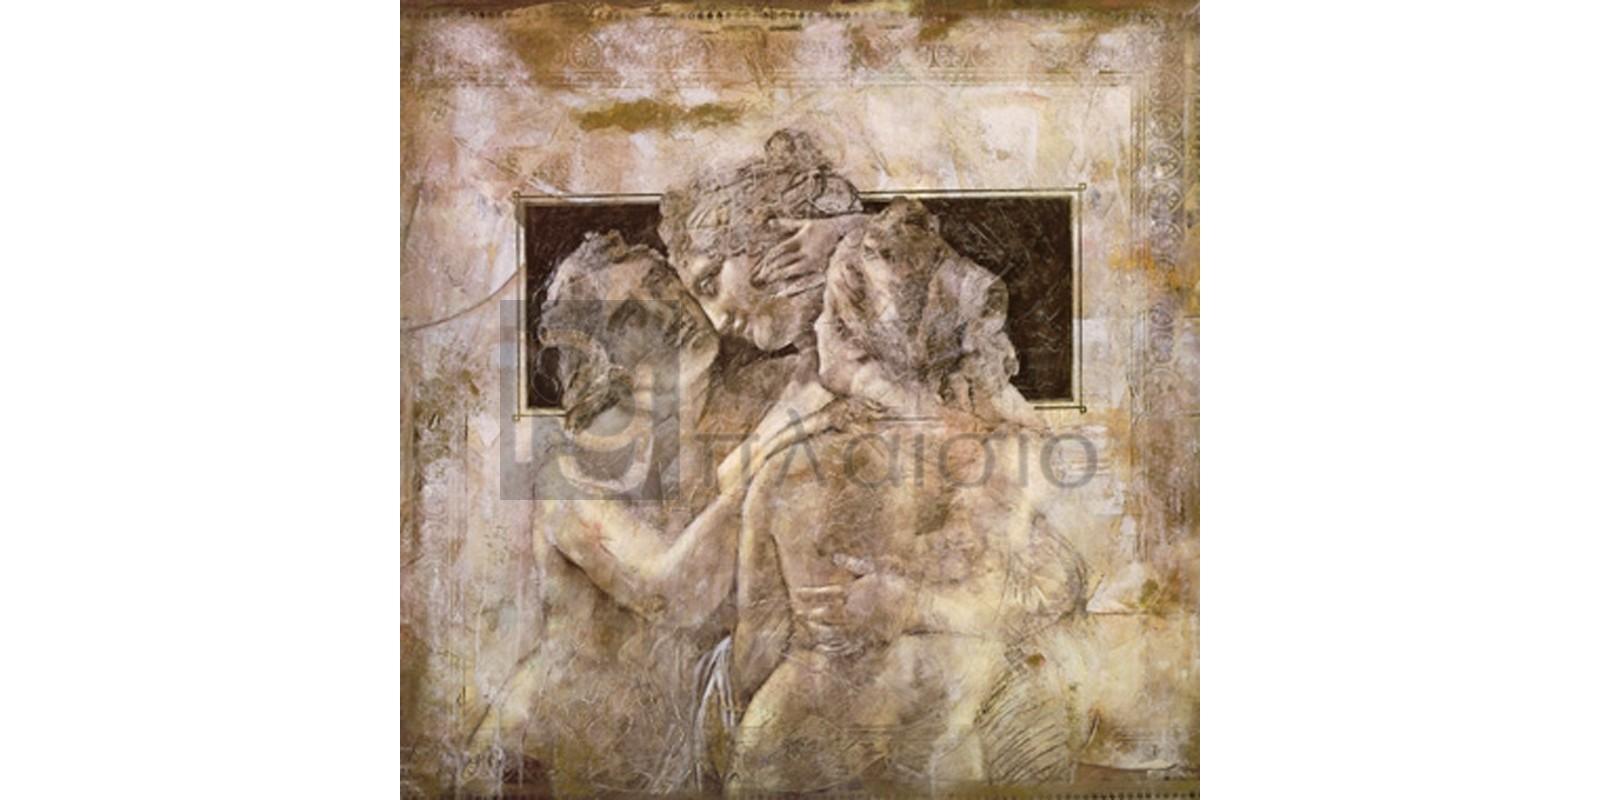 Franklin Richard - Stoic Romance III